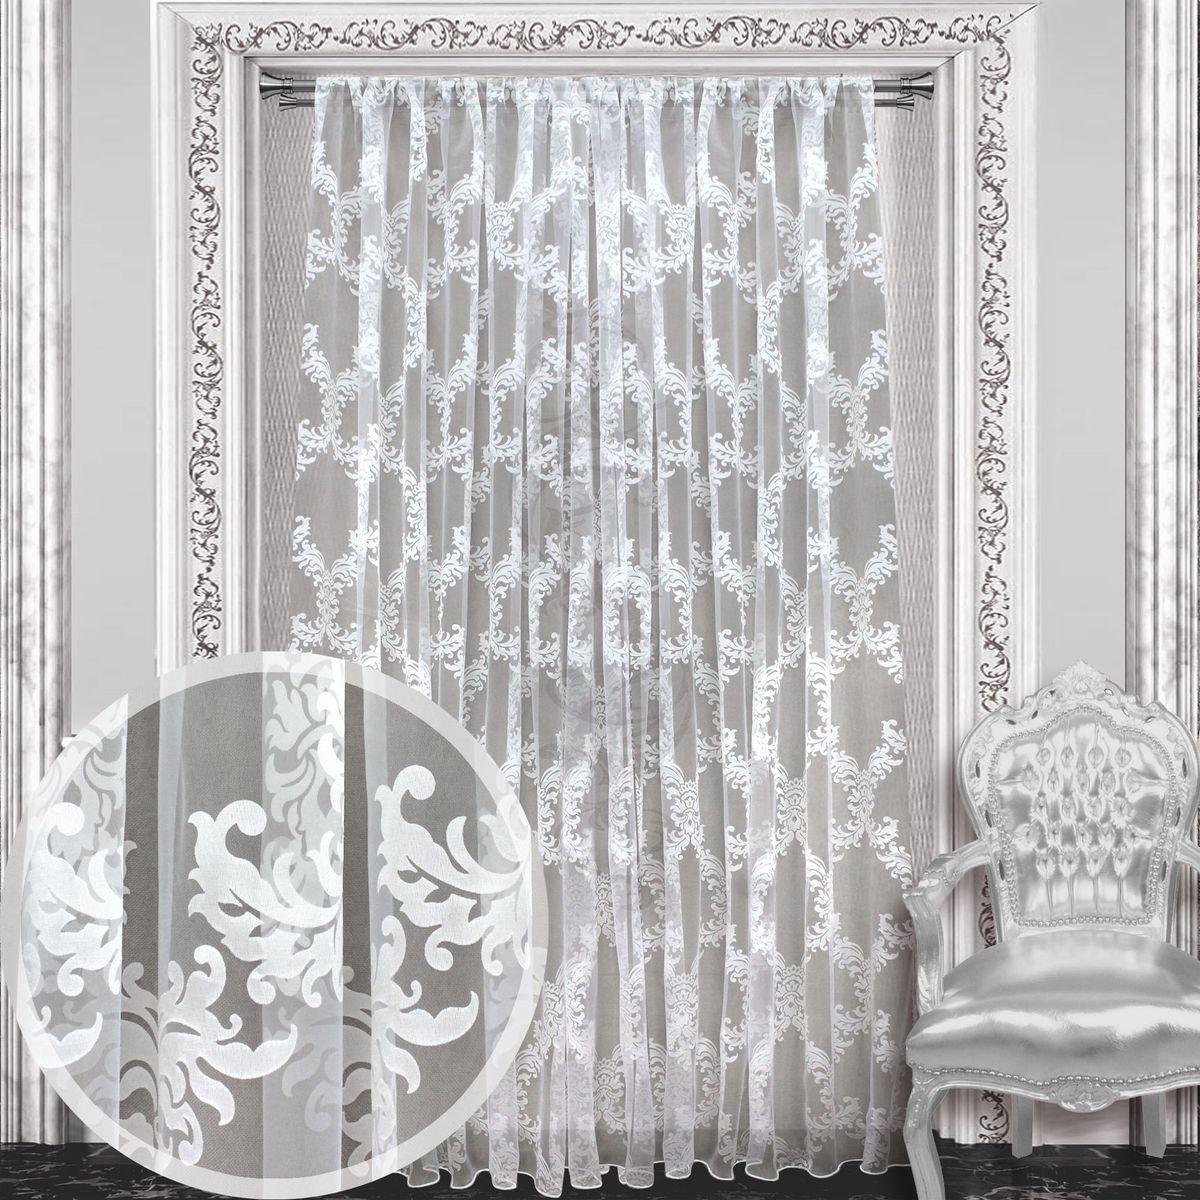 Тюль Amore Mio, 300 х 270 см, 1 шт., цвет: белый. 8611686116